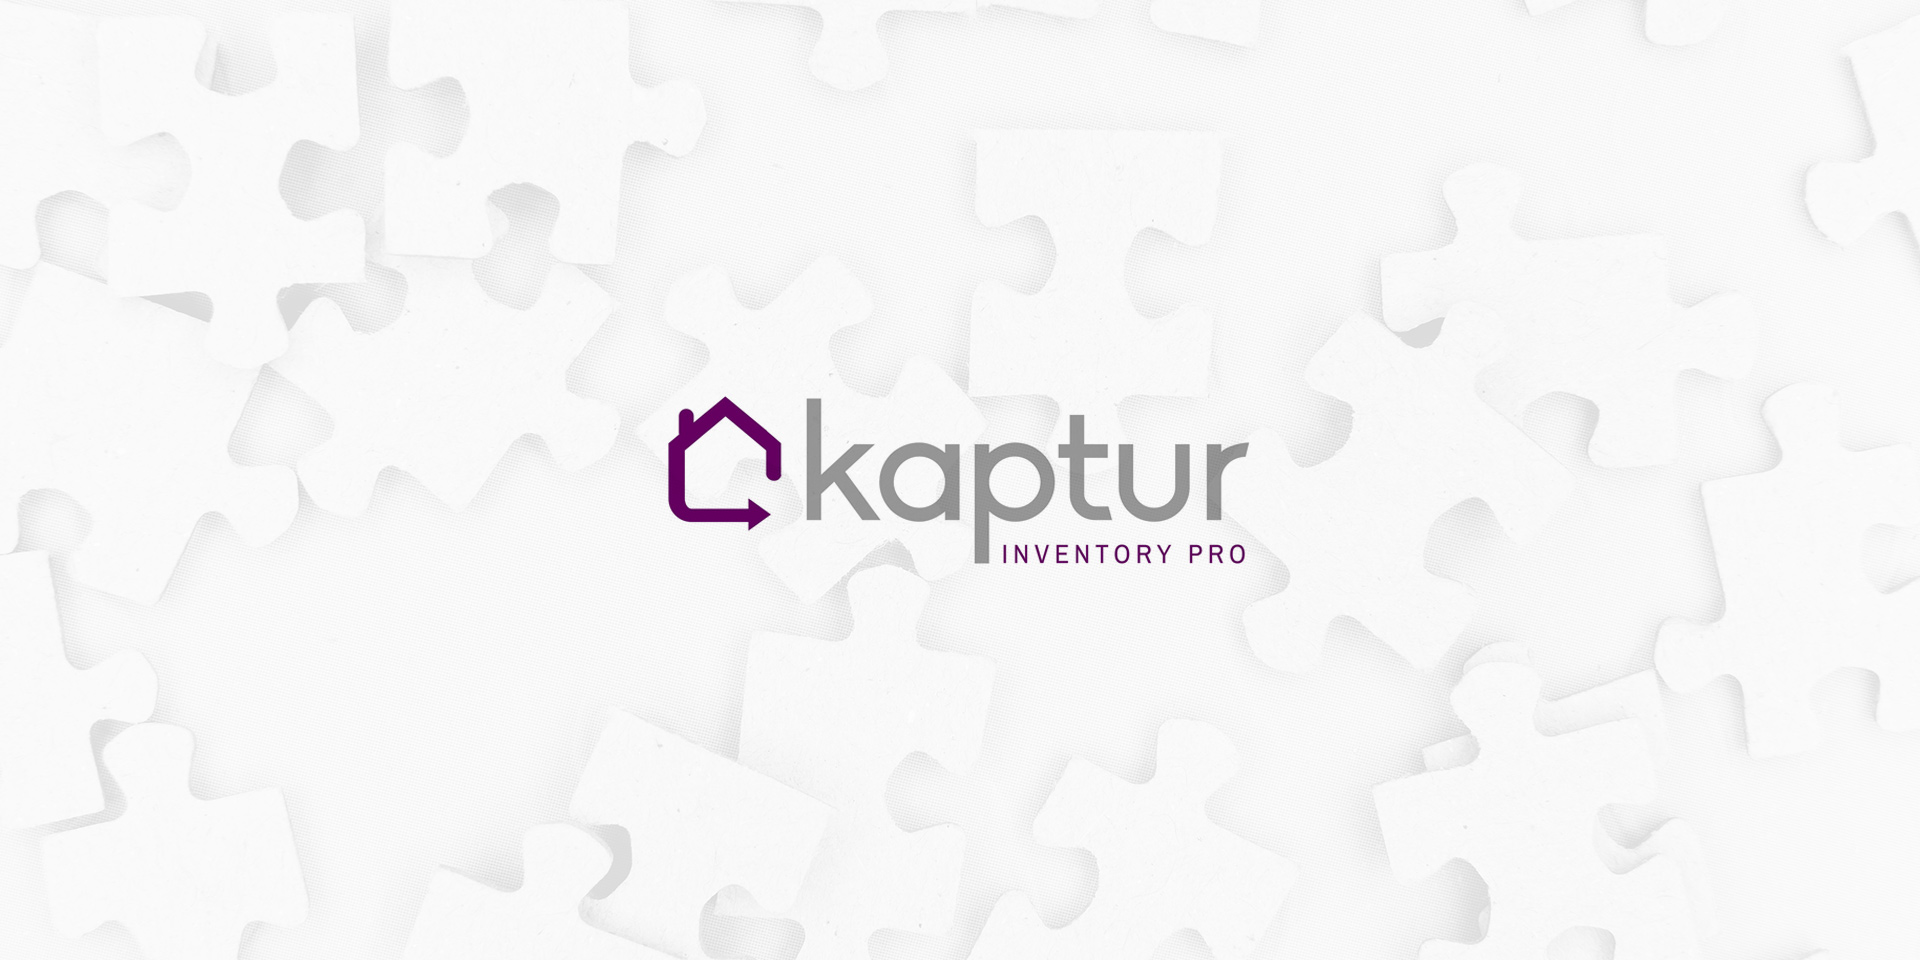 Inventory App Kaptur Integrates with Fixflo